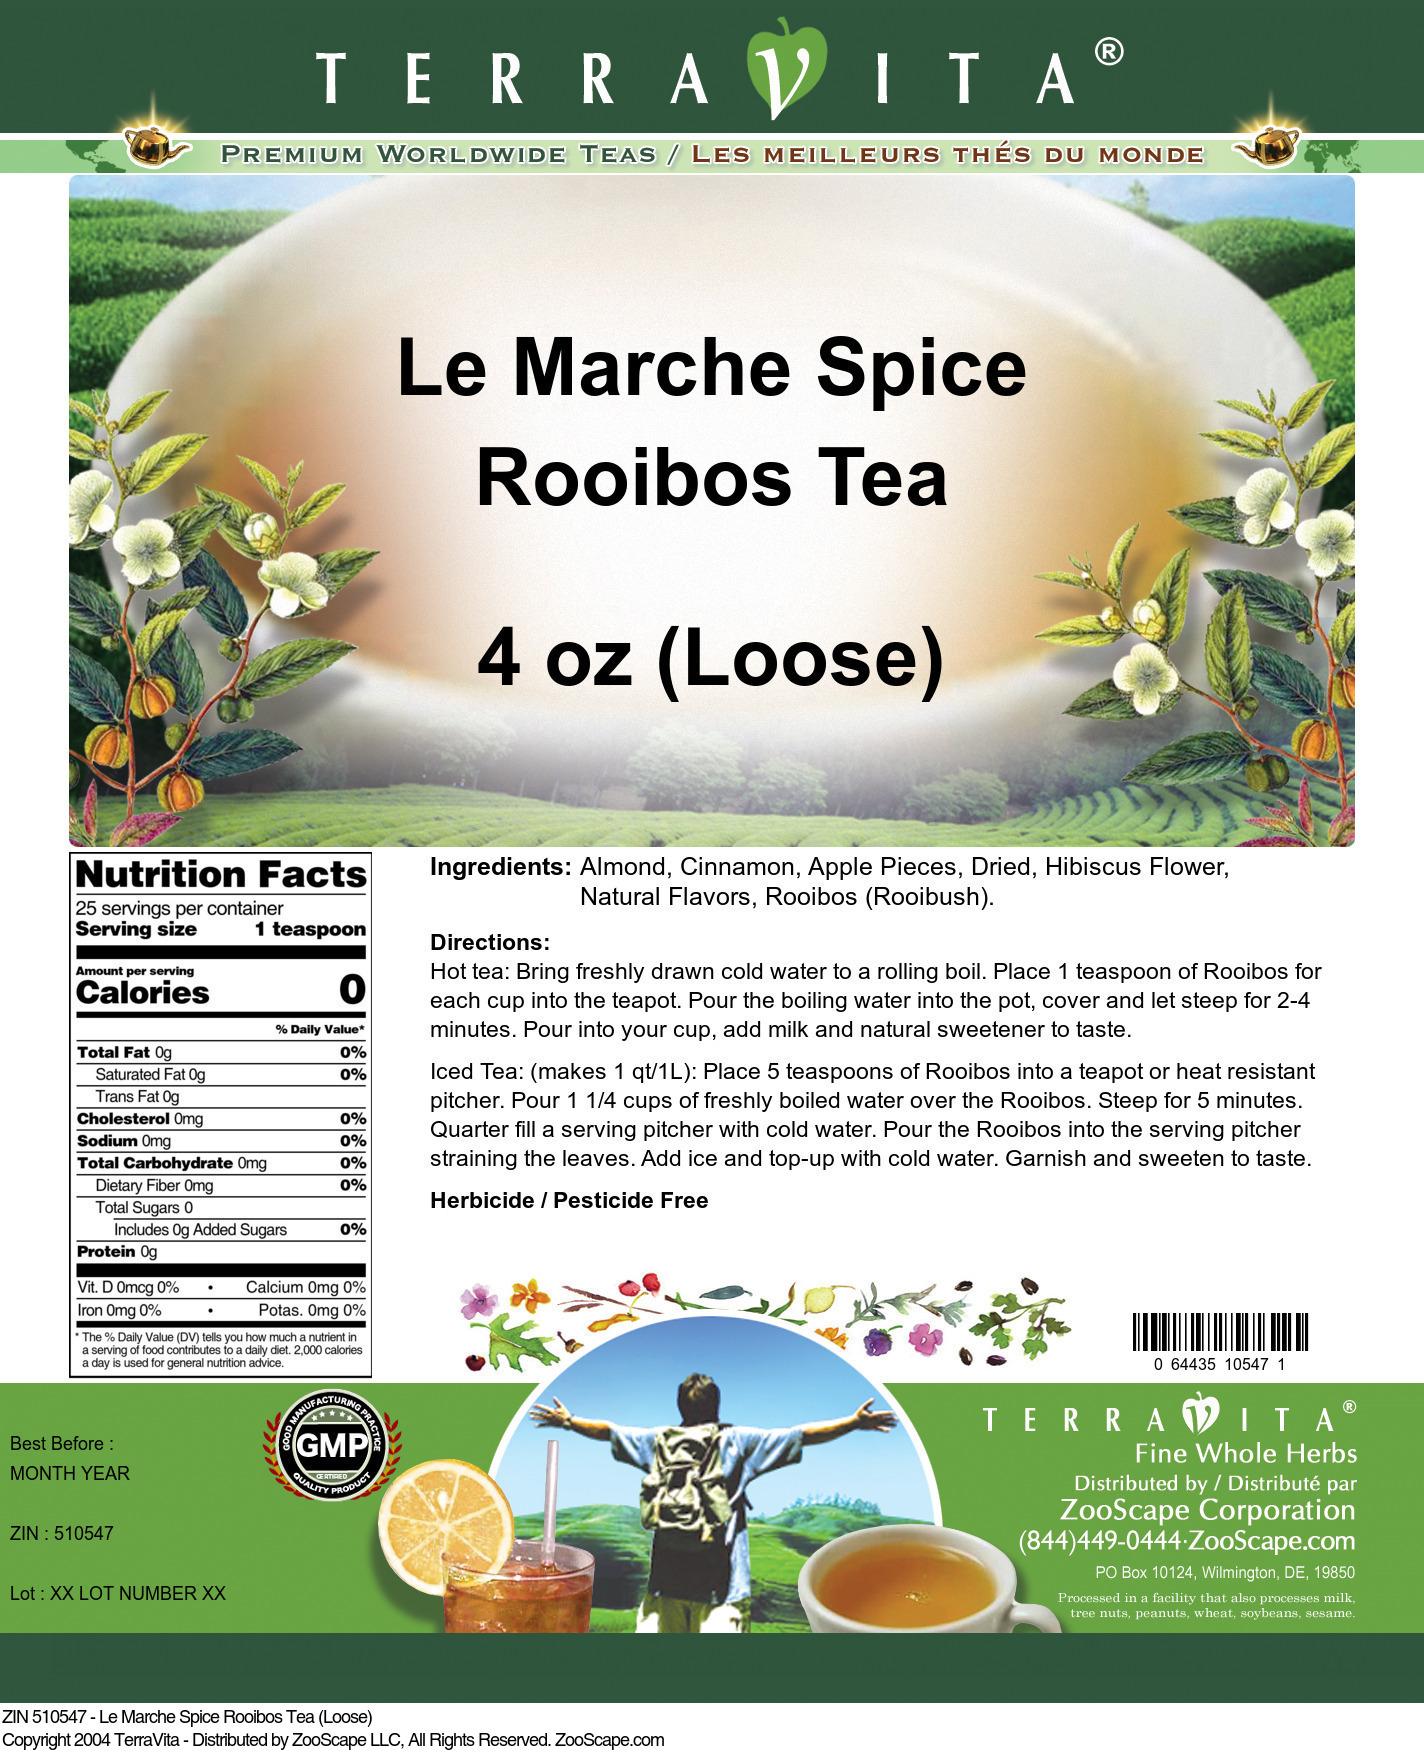 Le Marche Spice Rooibos